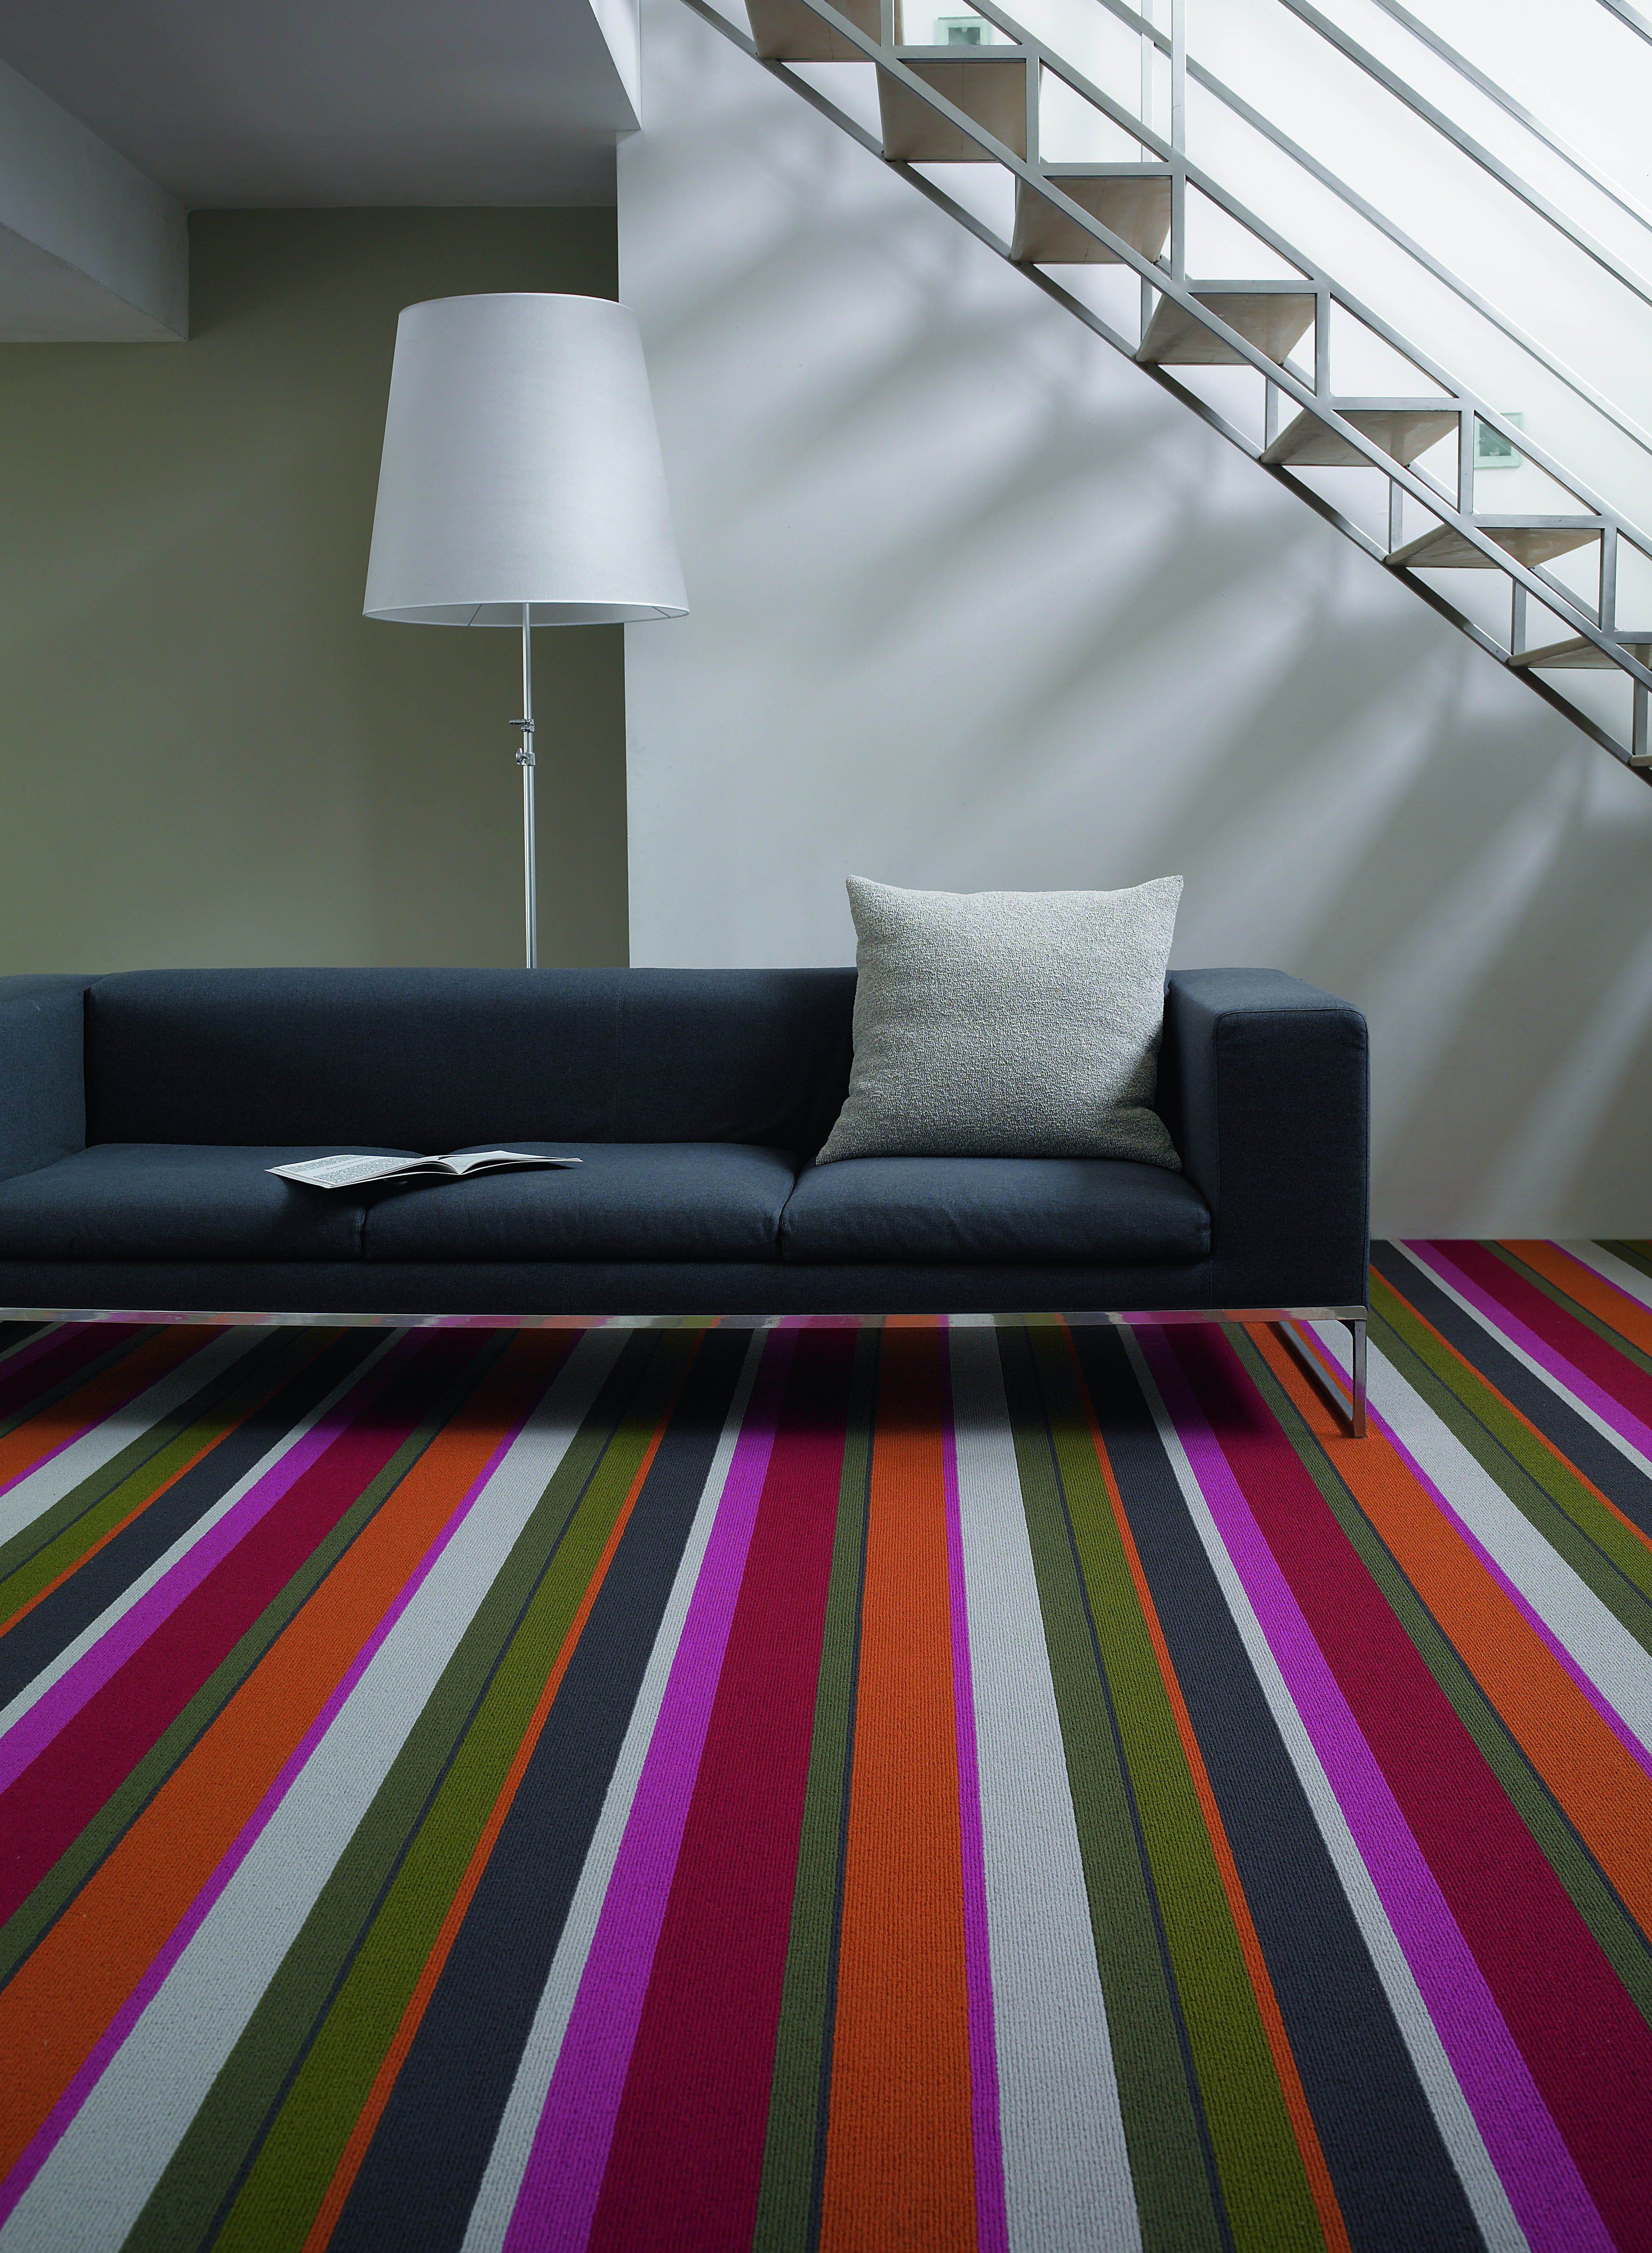 Striped carpet striped carpets designer strip carpet contemporary striped carpet striped carpets designer strip carpet contemporary baanklon Image collections